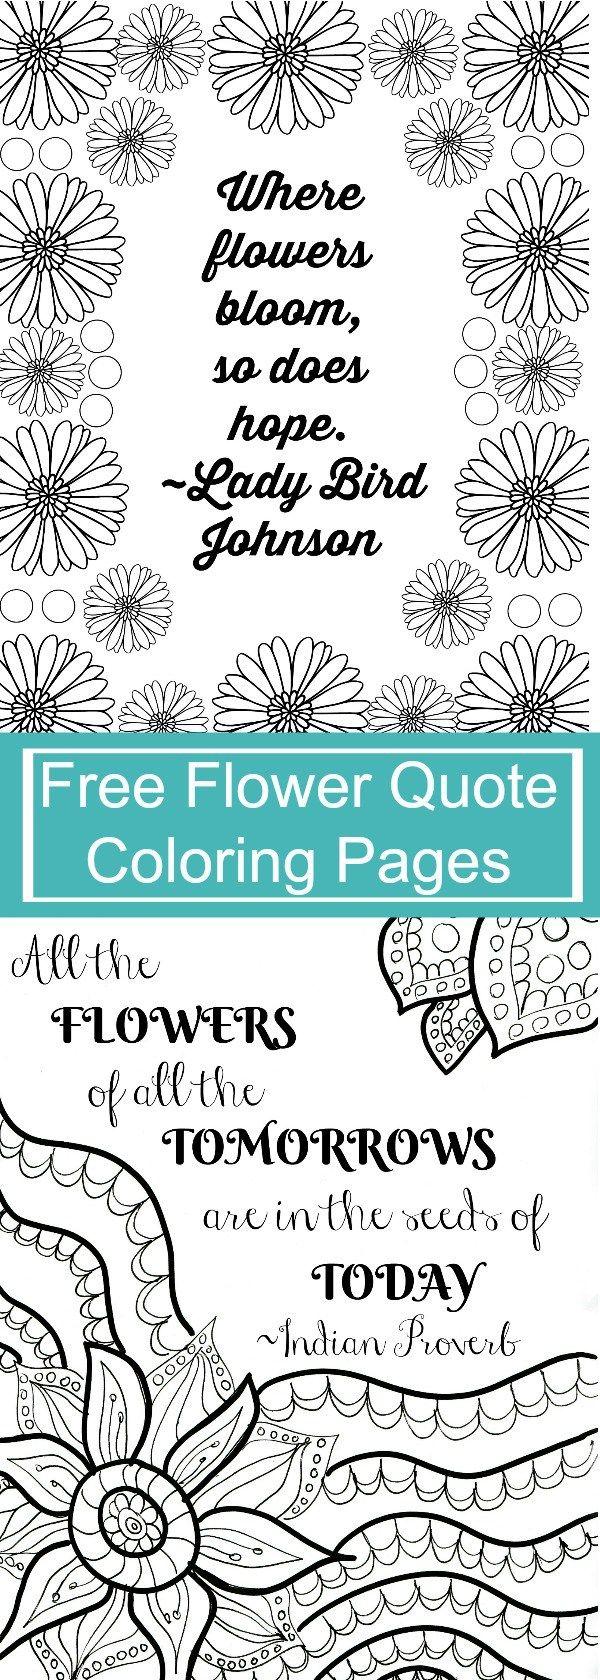 67 best art ideas images on Pinterest   Art ideas, Activities for ...